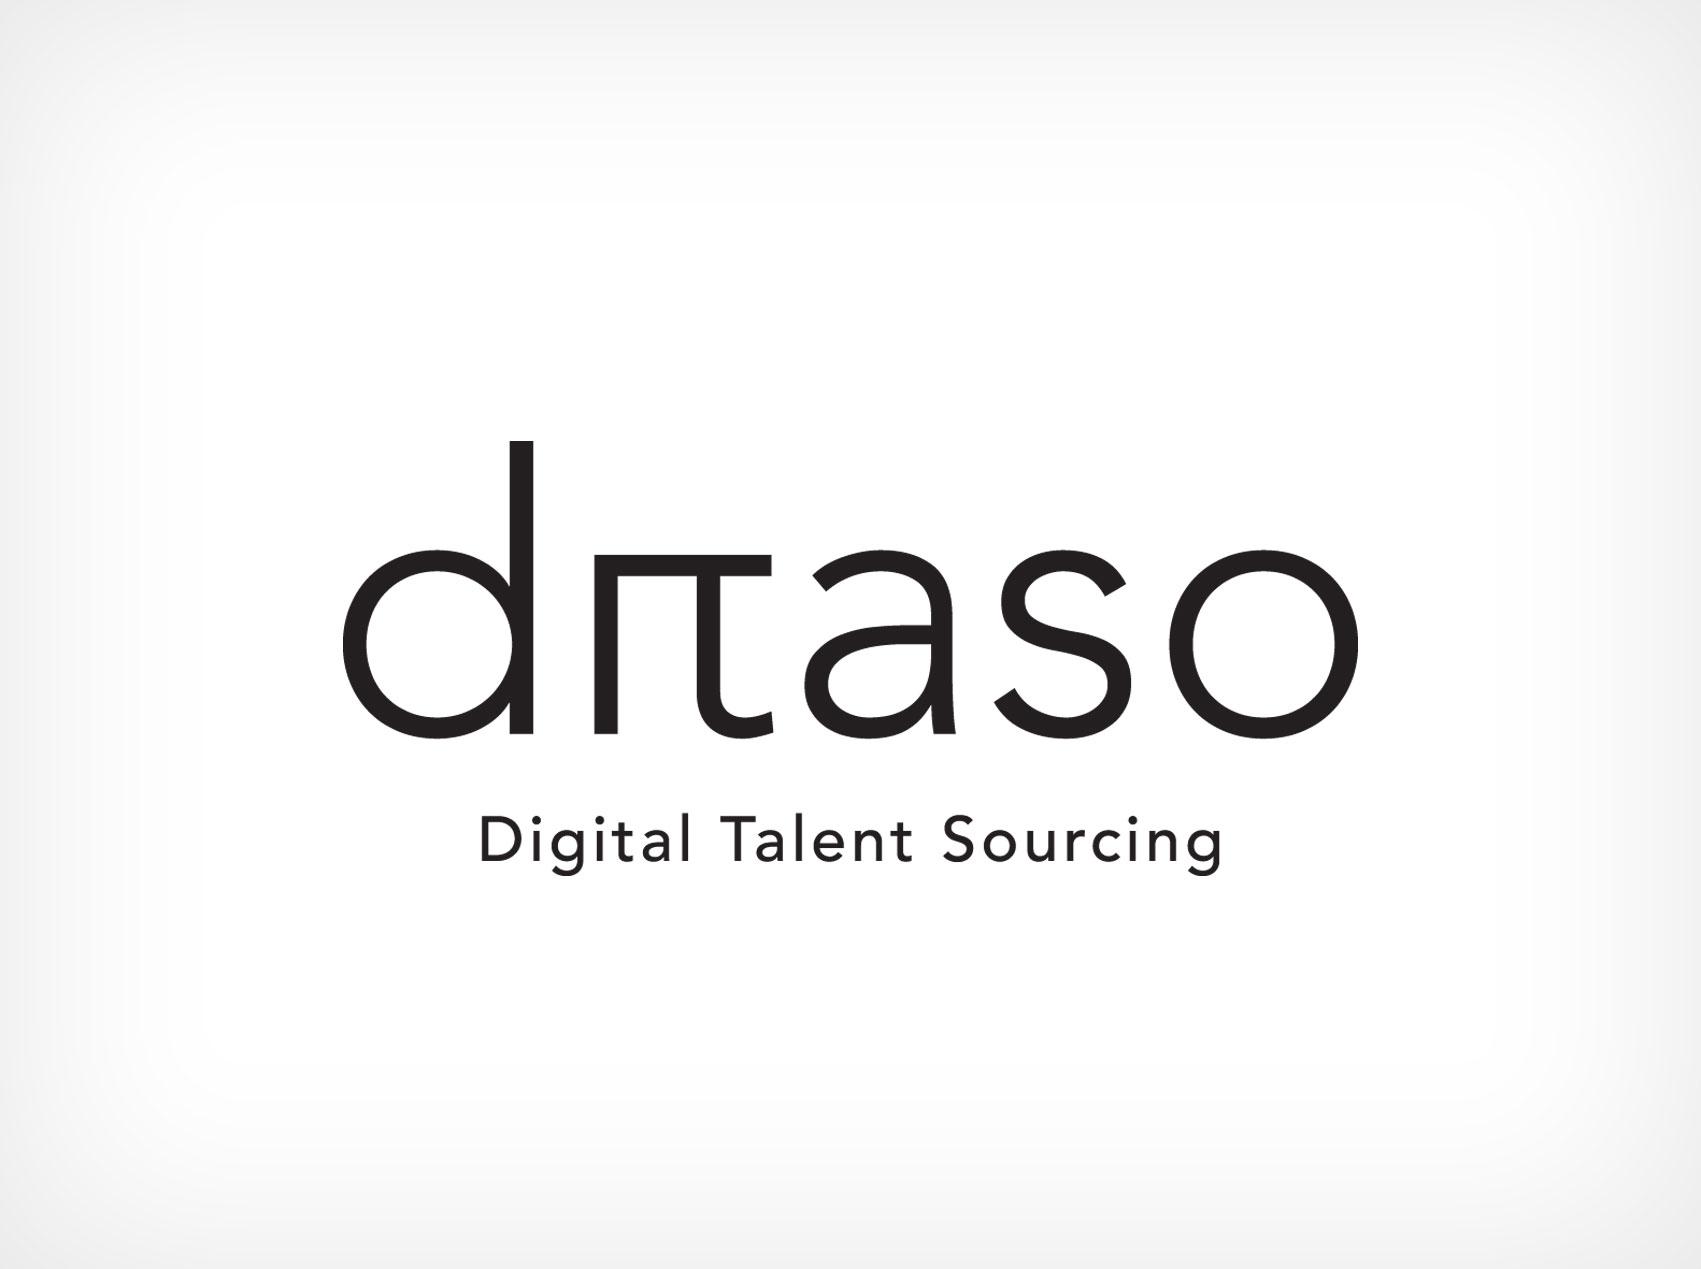 Ditaso